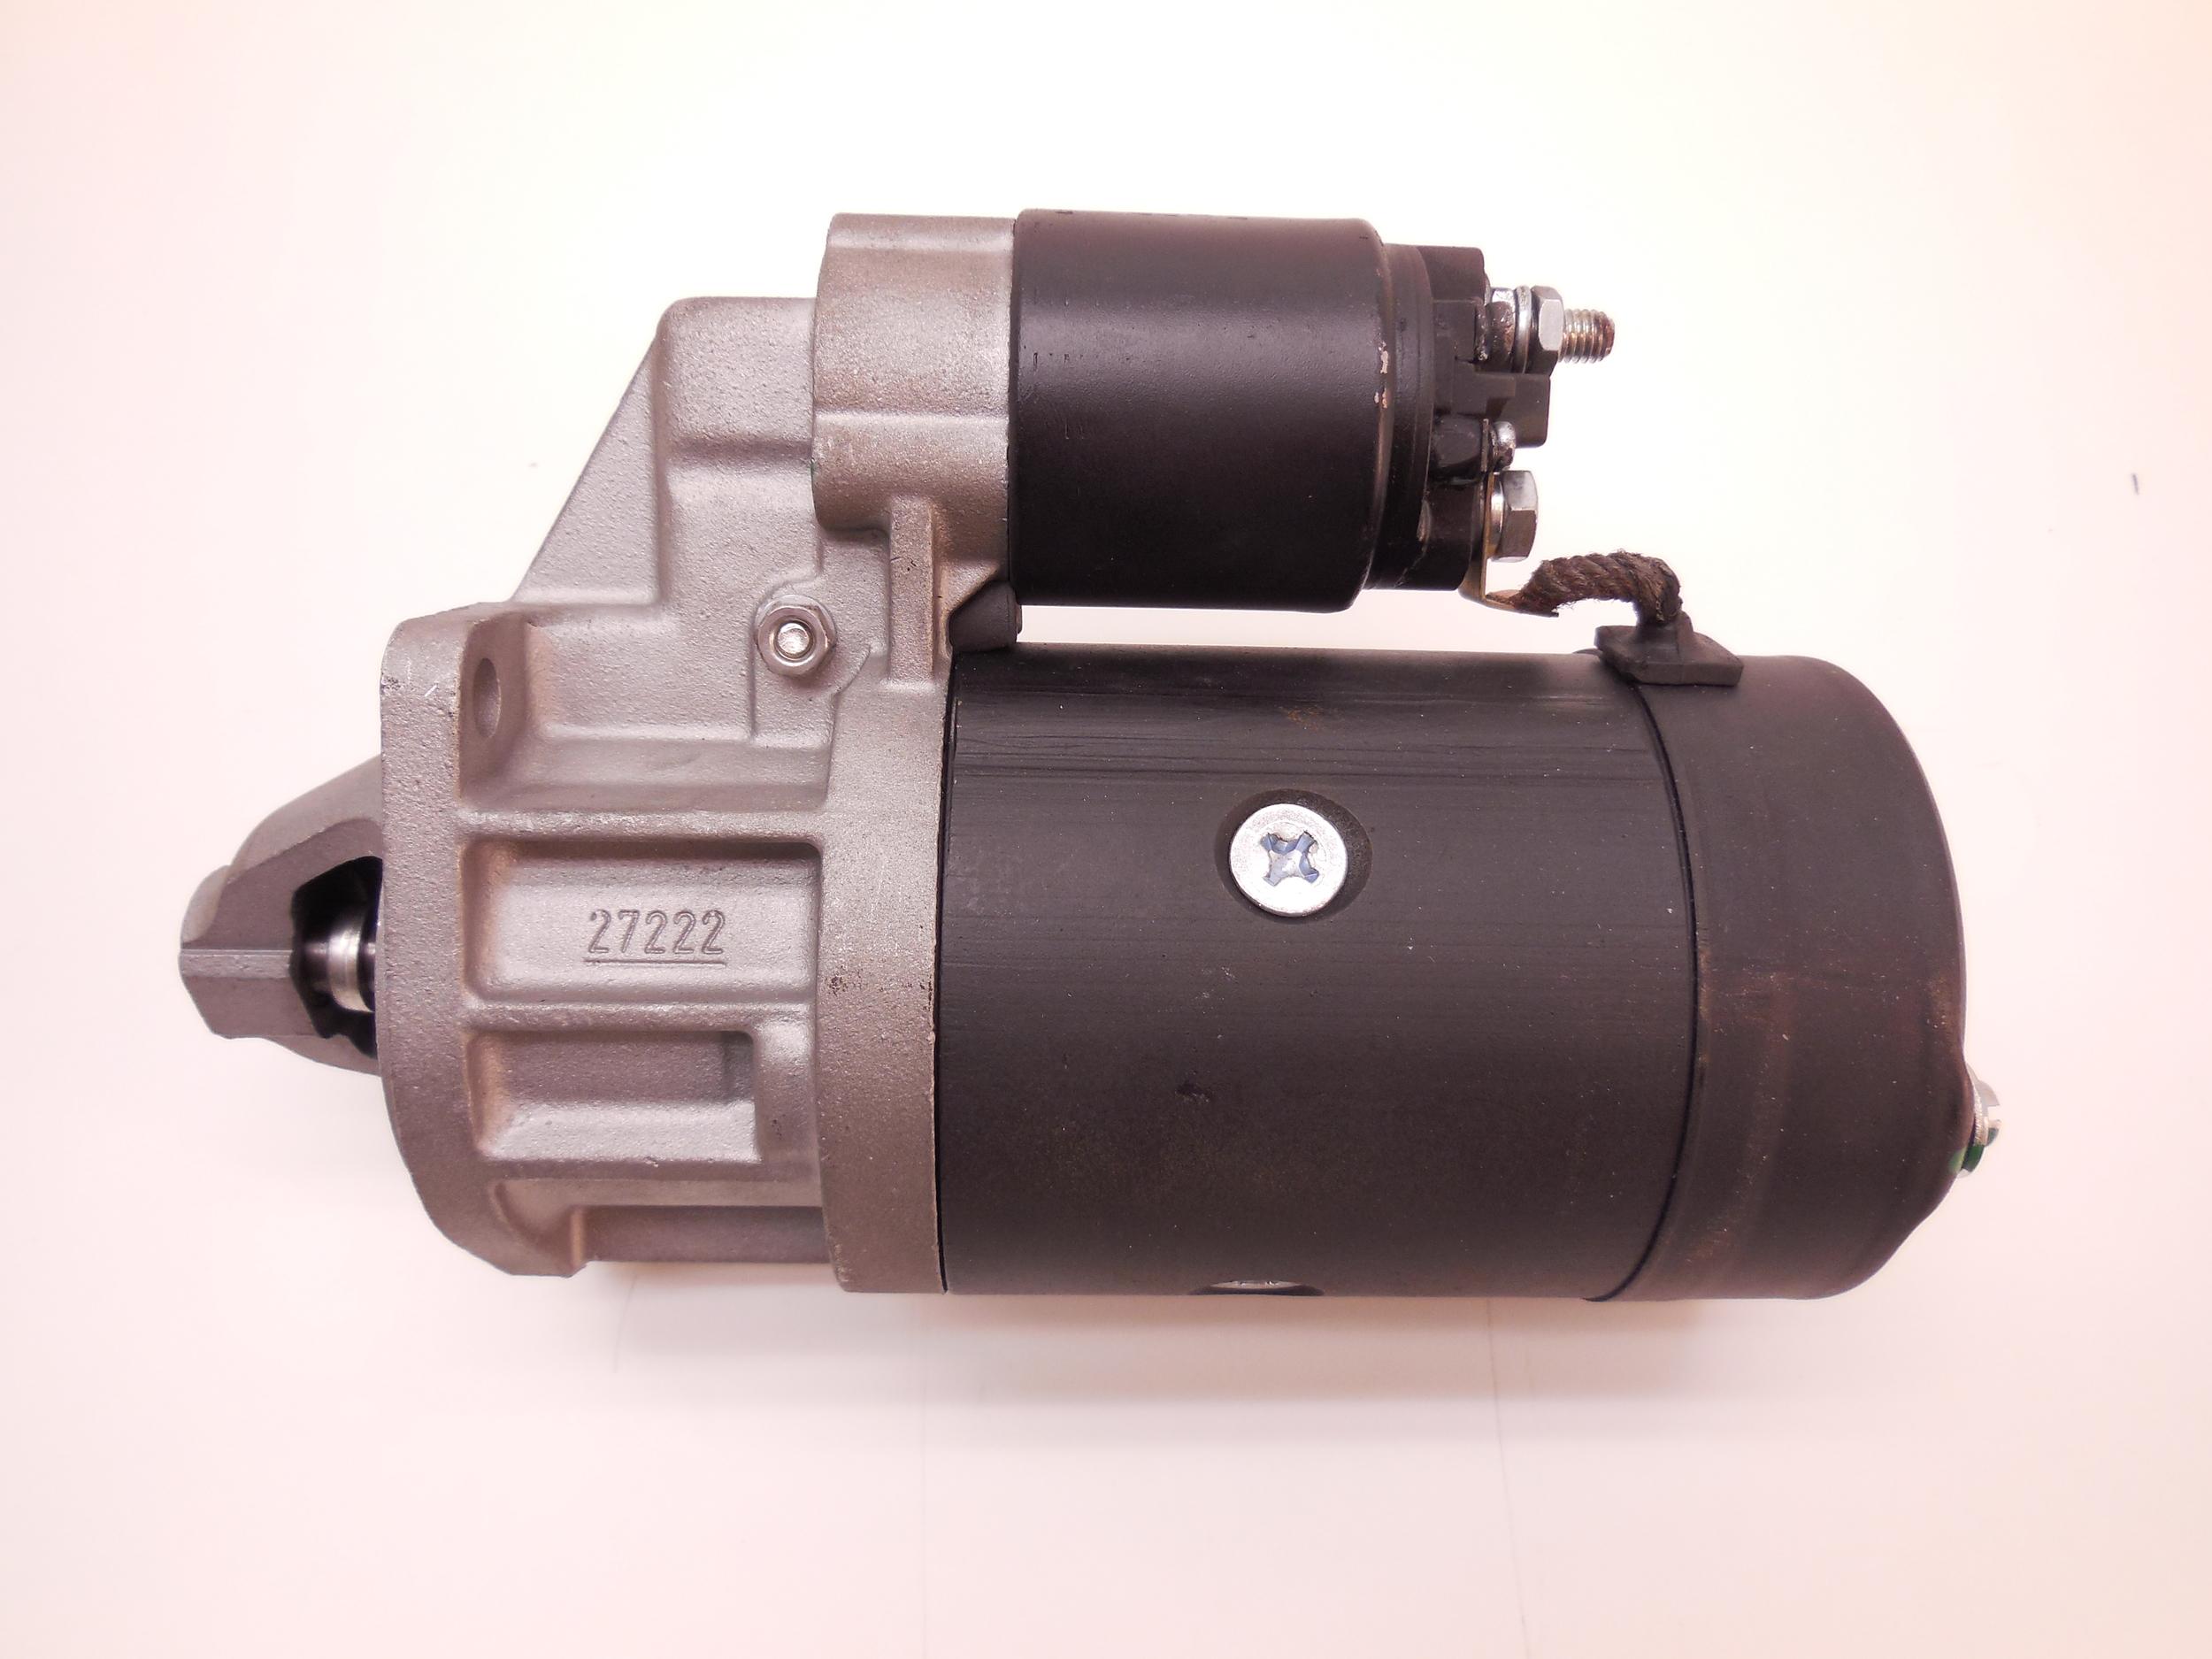 Starter Motor Häggo Nr: 253 6205-801 Price: 4950 SEK